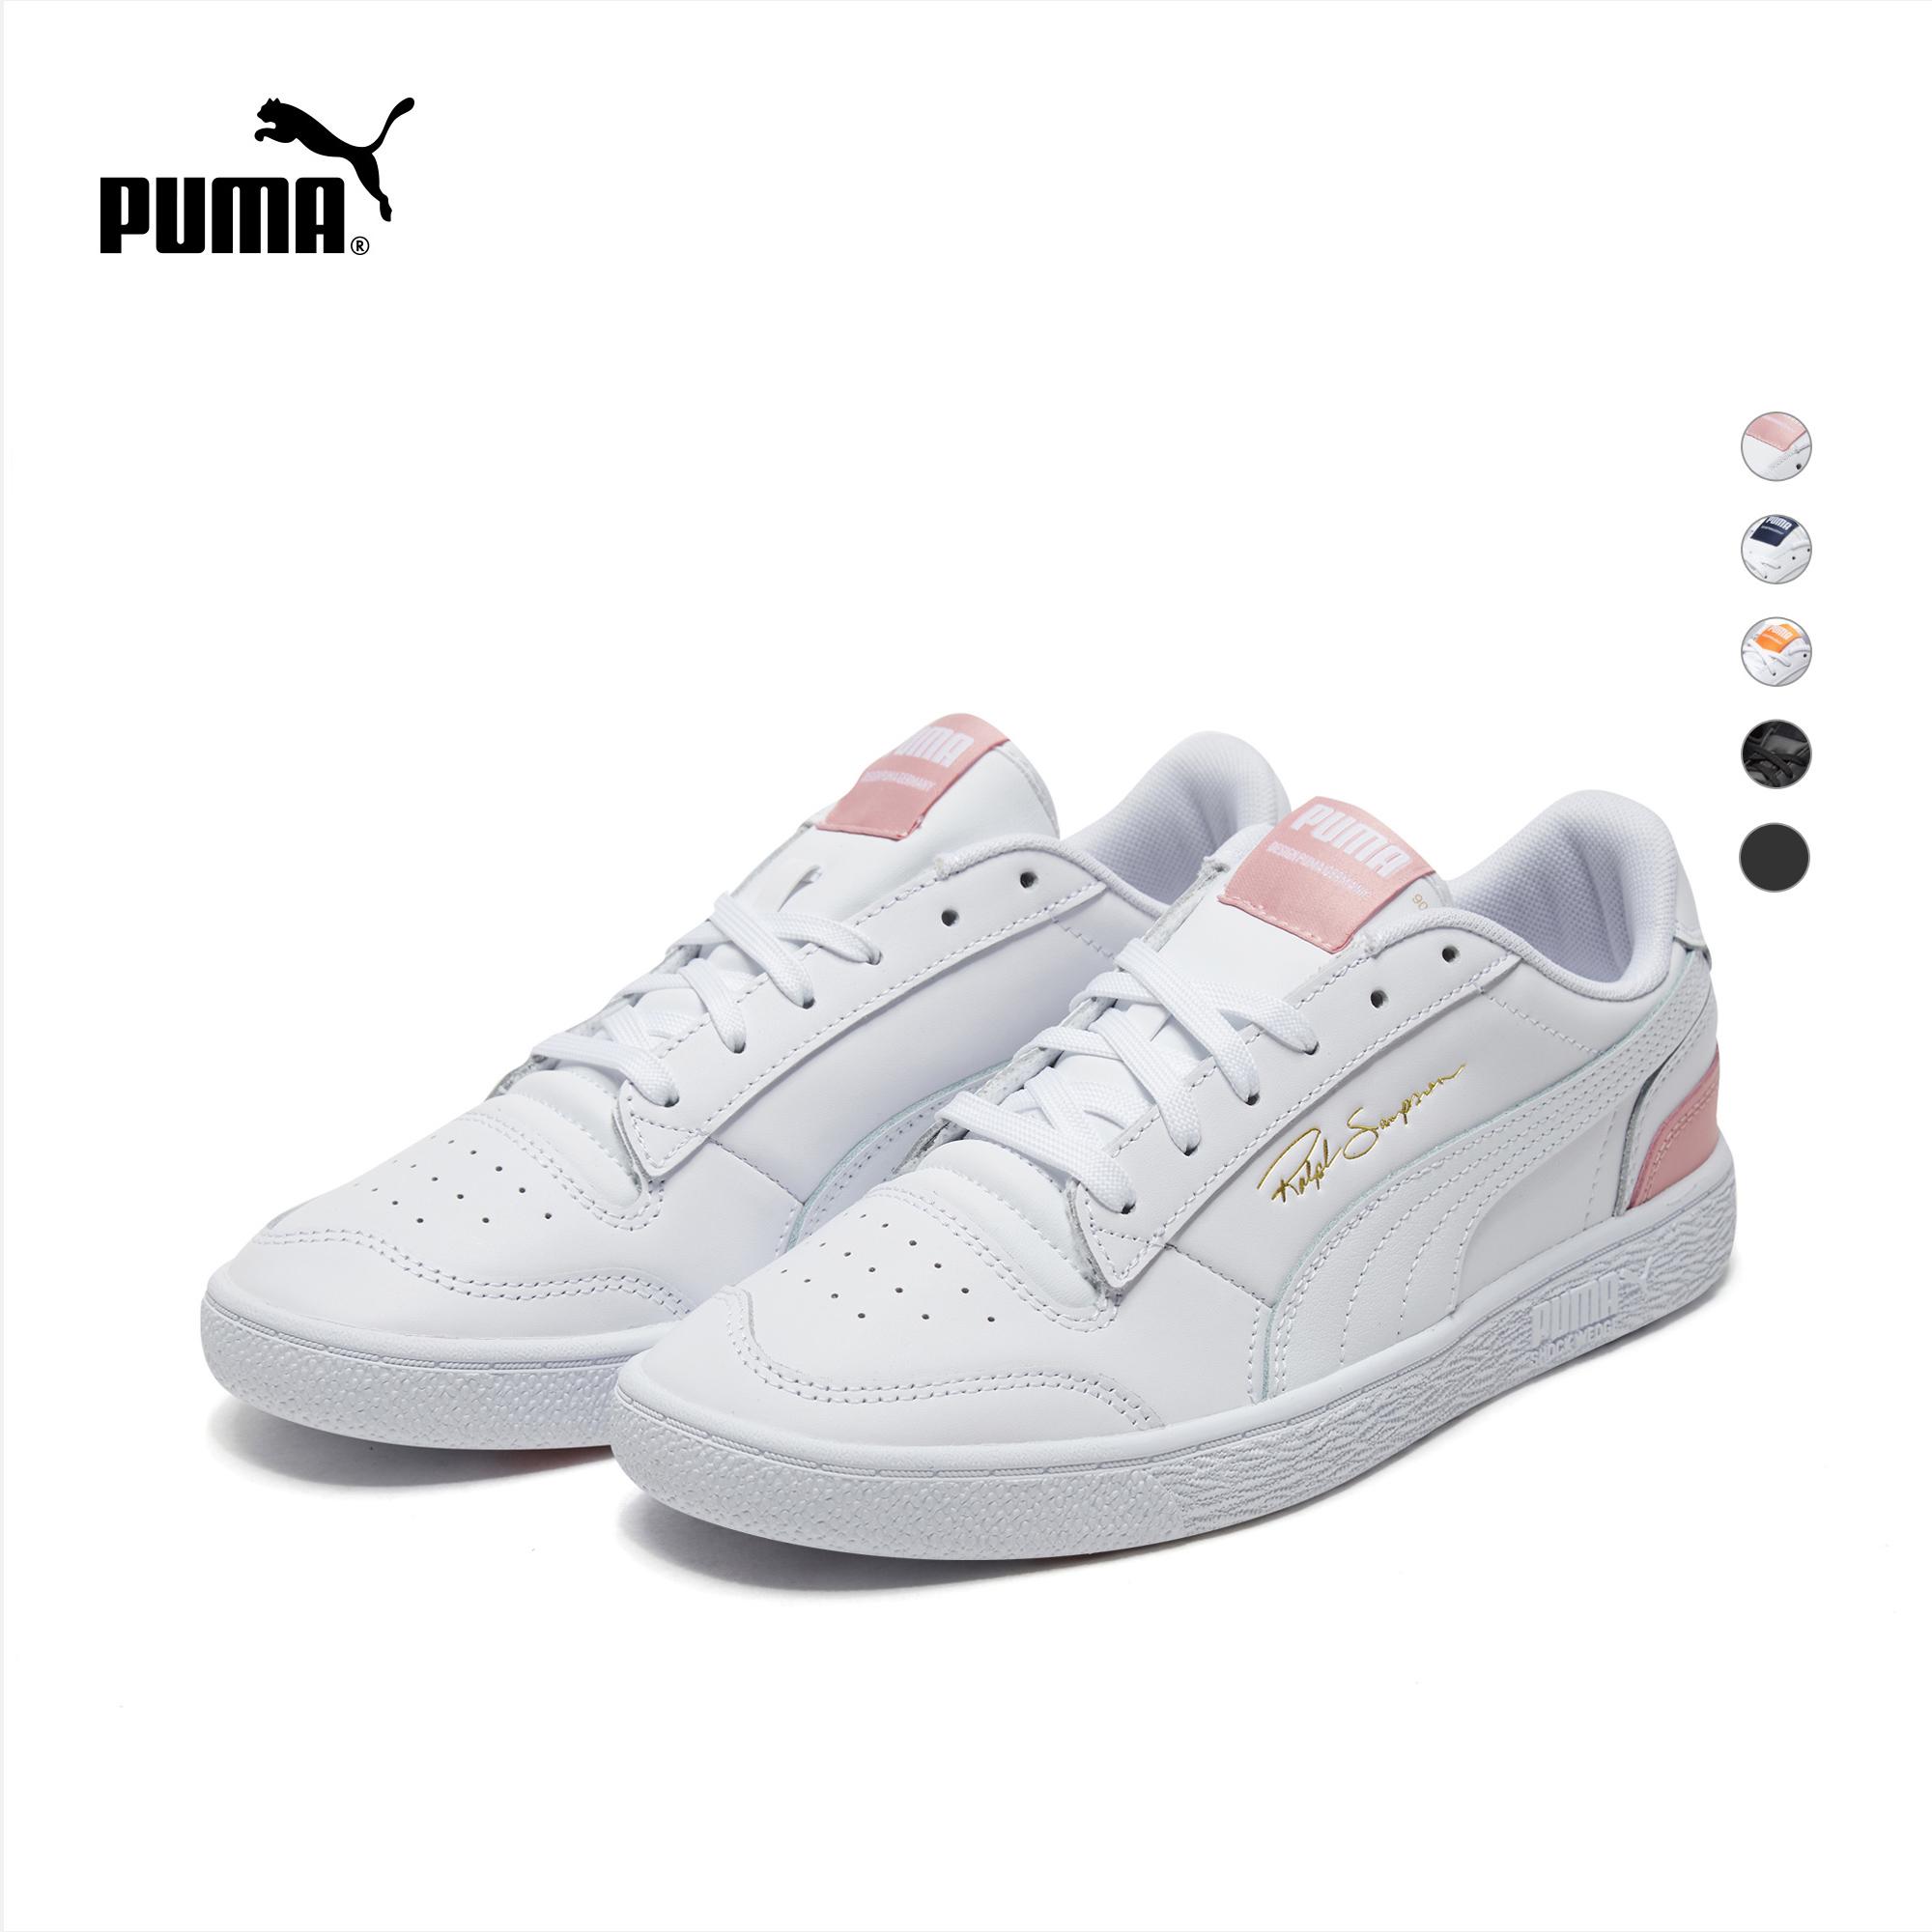 Puma 滑板鞋 Ralph Sampson